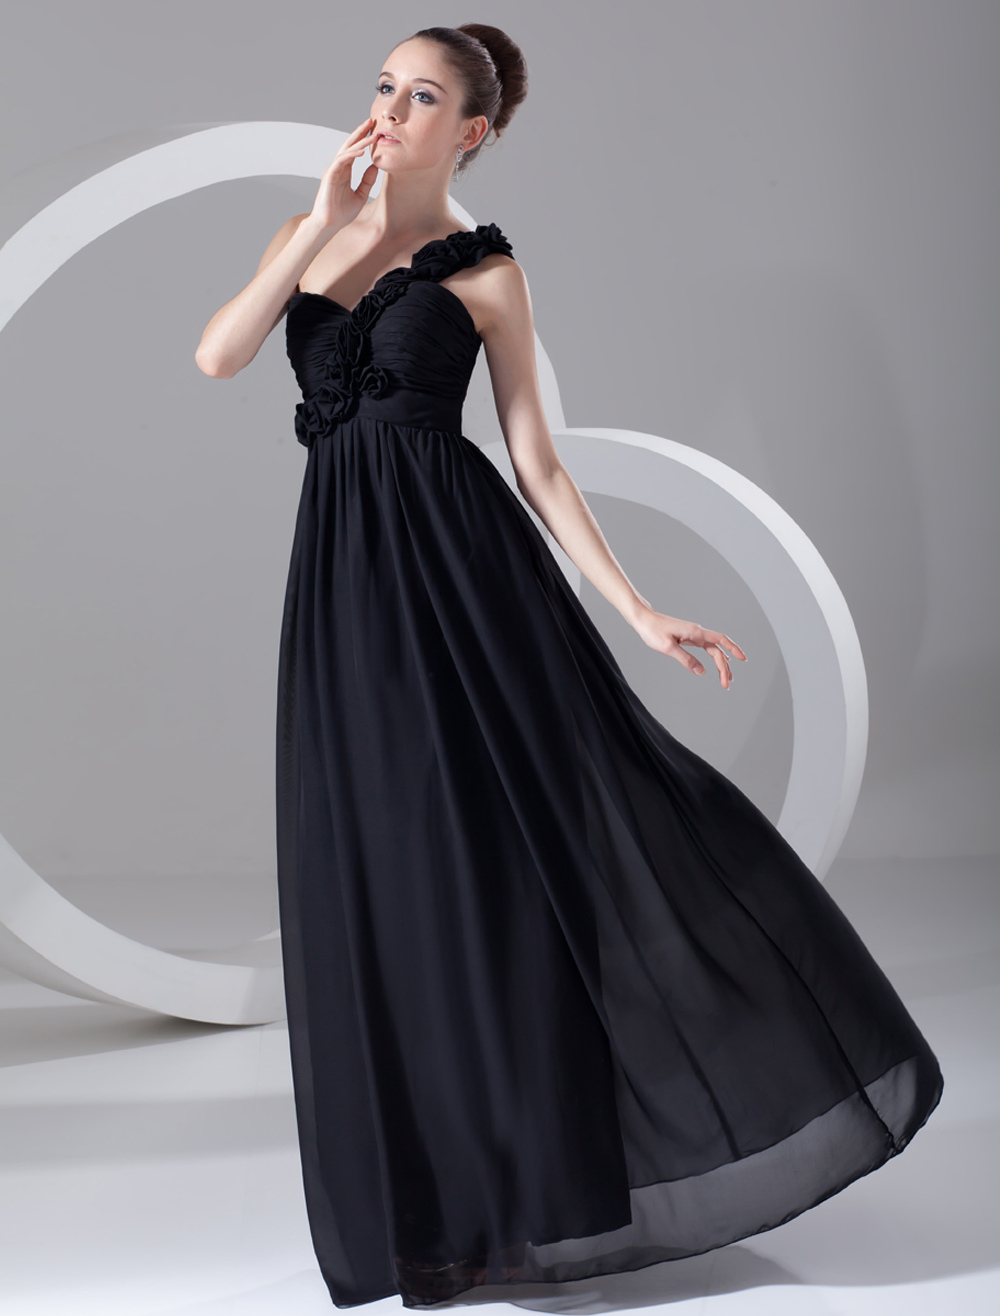 Black Chiffon Floral One-Shoulder Evening Dress (Wedding Cheap Party Dress) photo